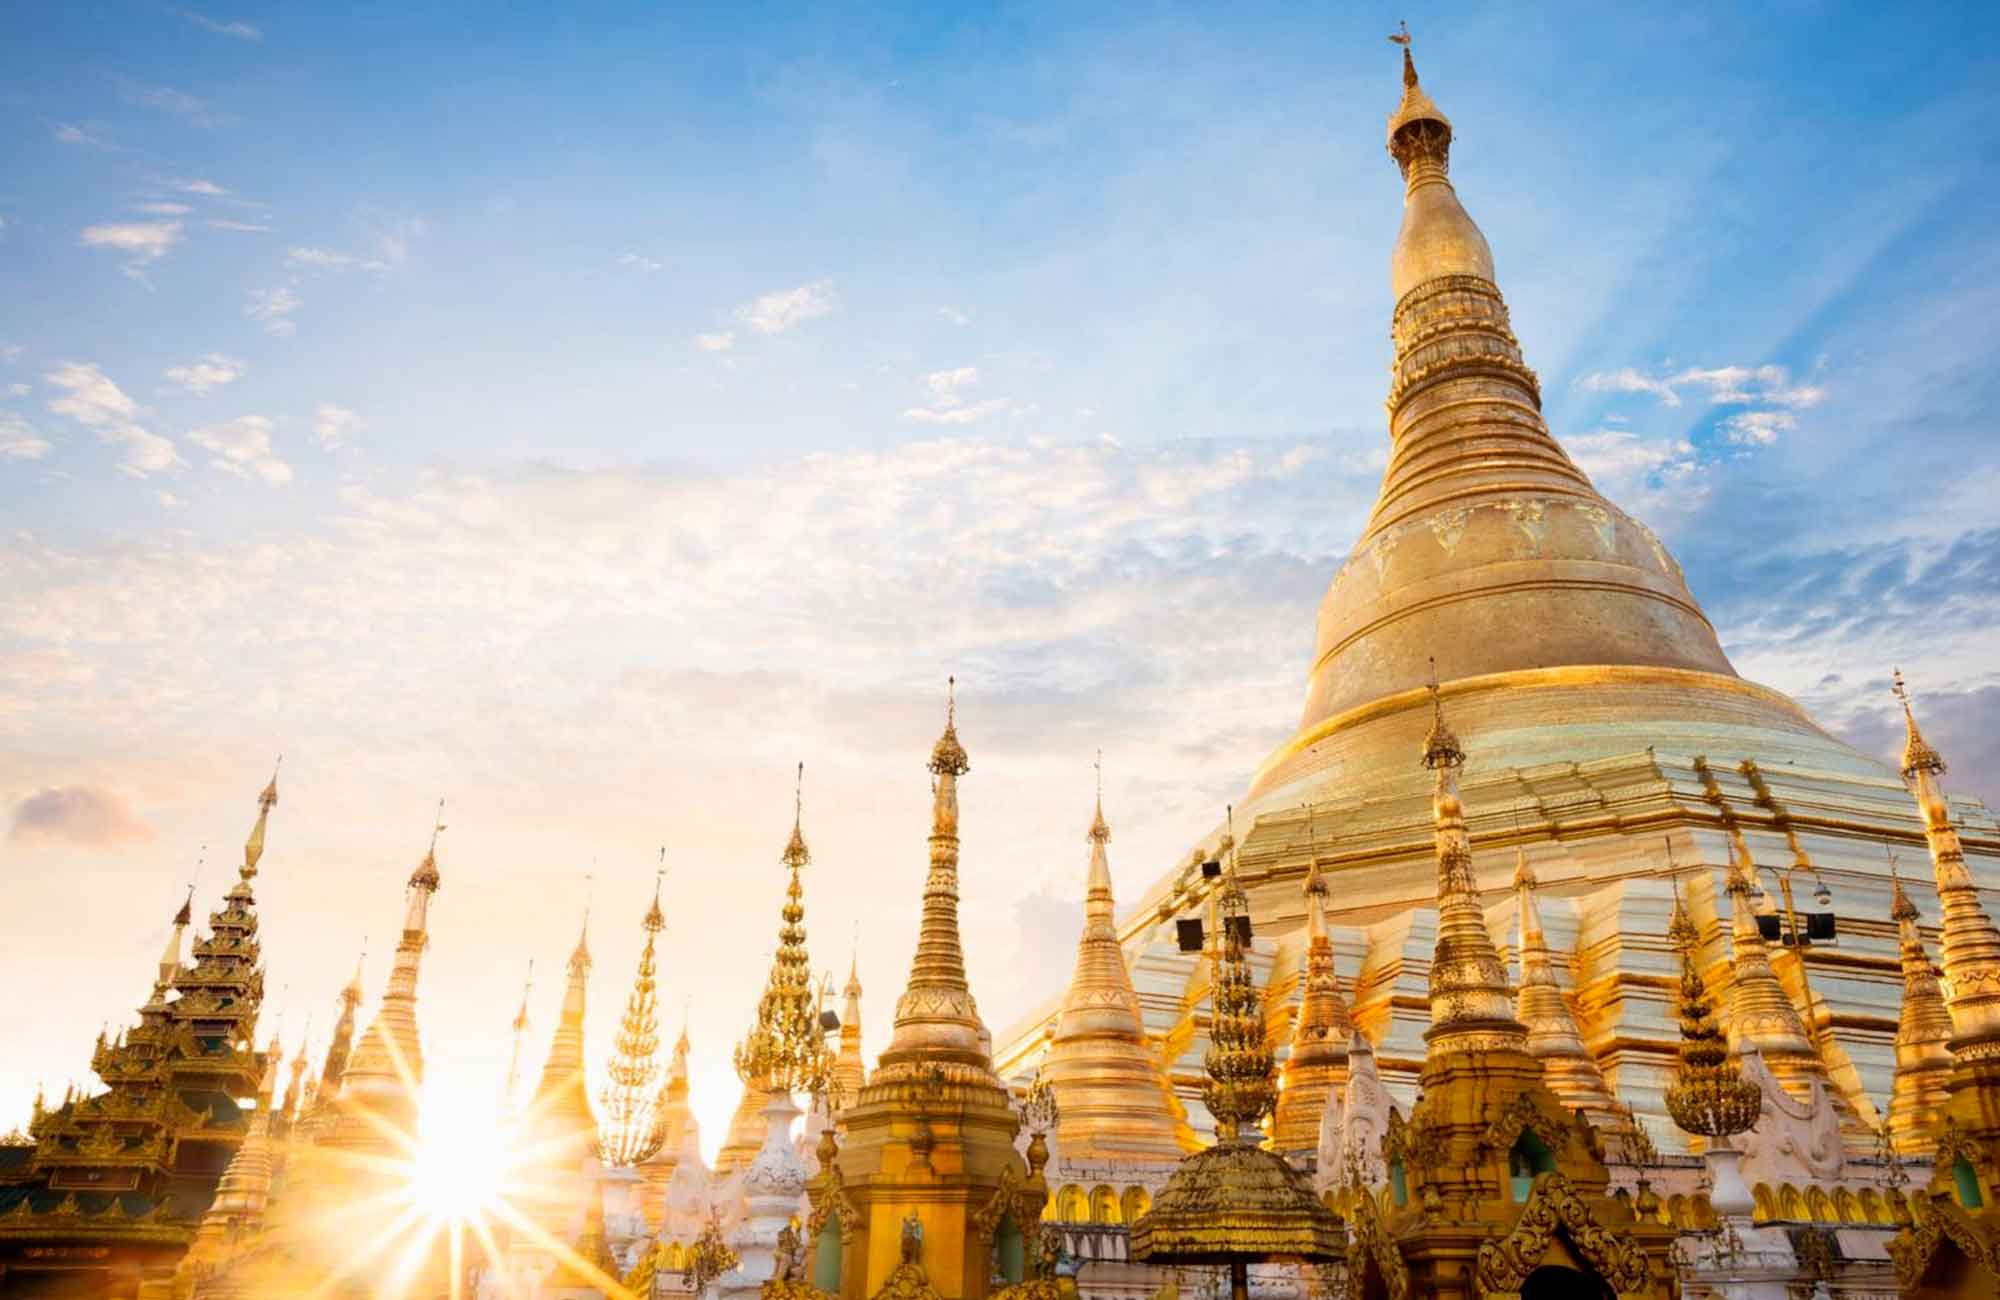 Voyage Birmanie-Myanmar - Pagode pagode shwedagon Yangon - Amplitudes